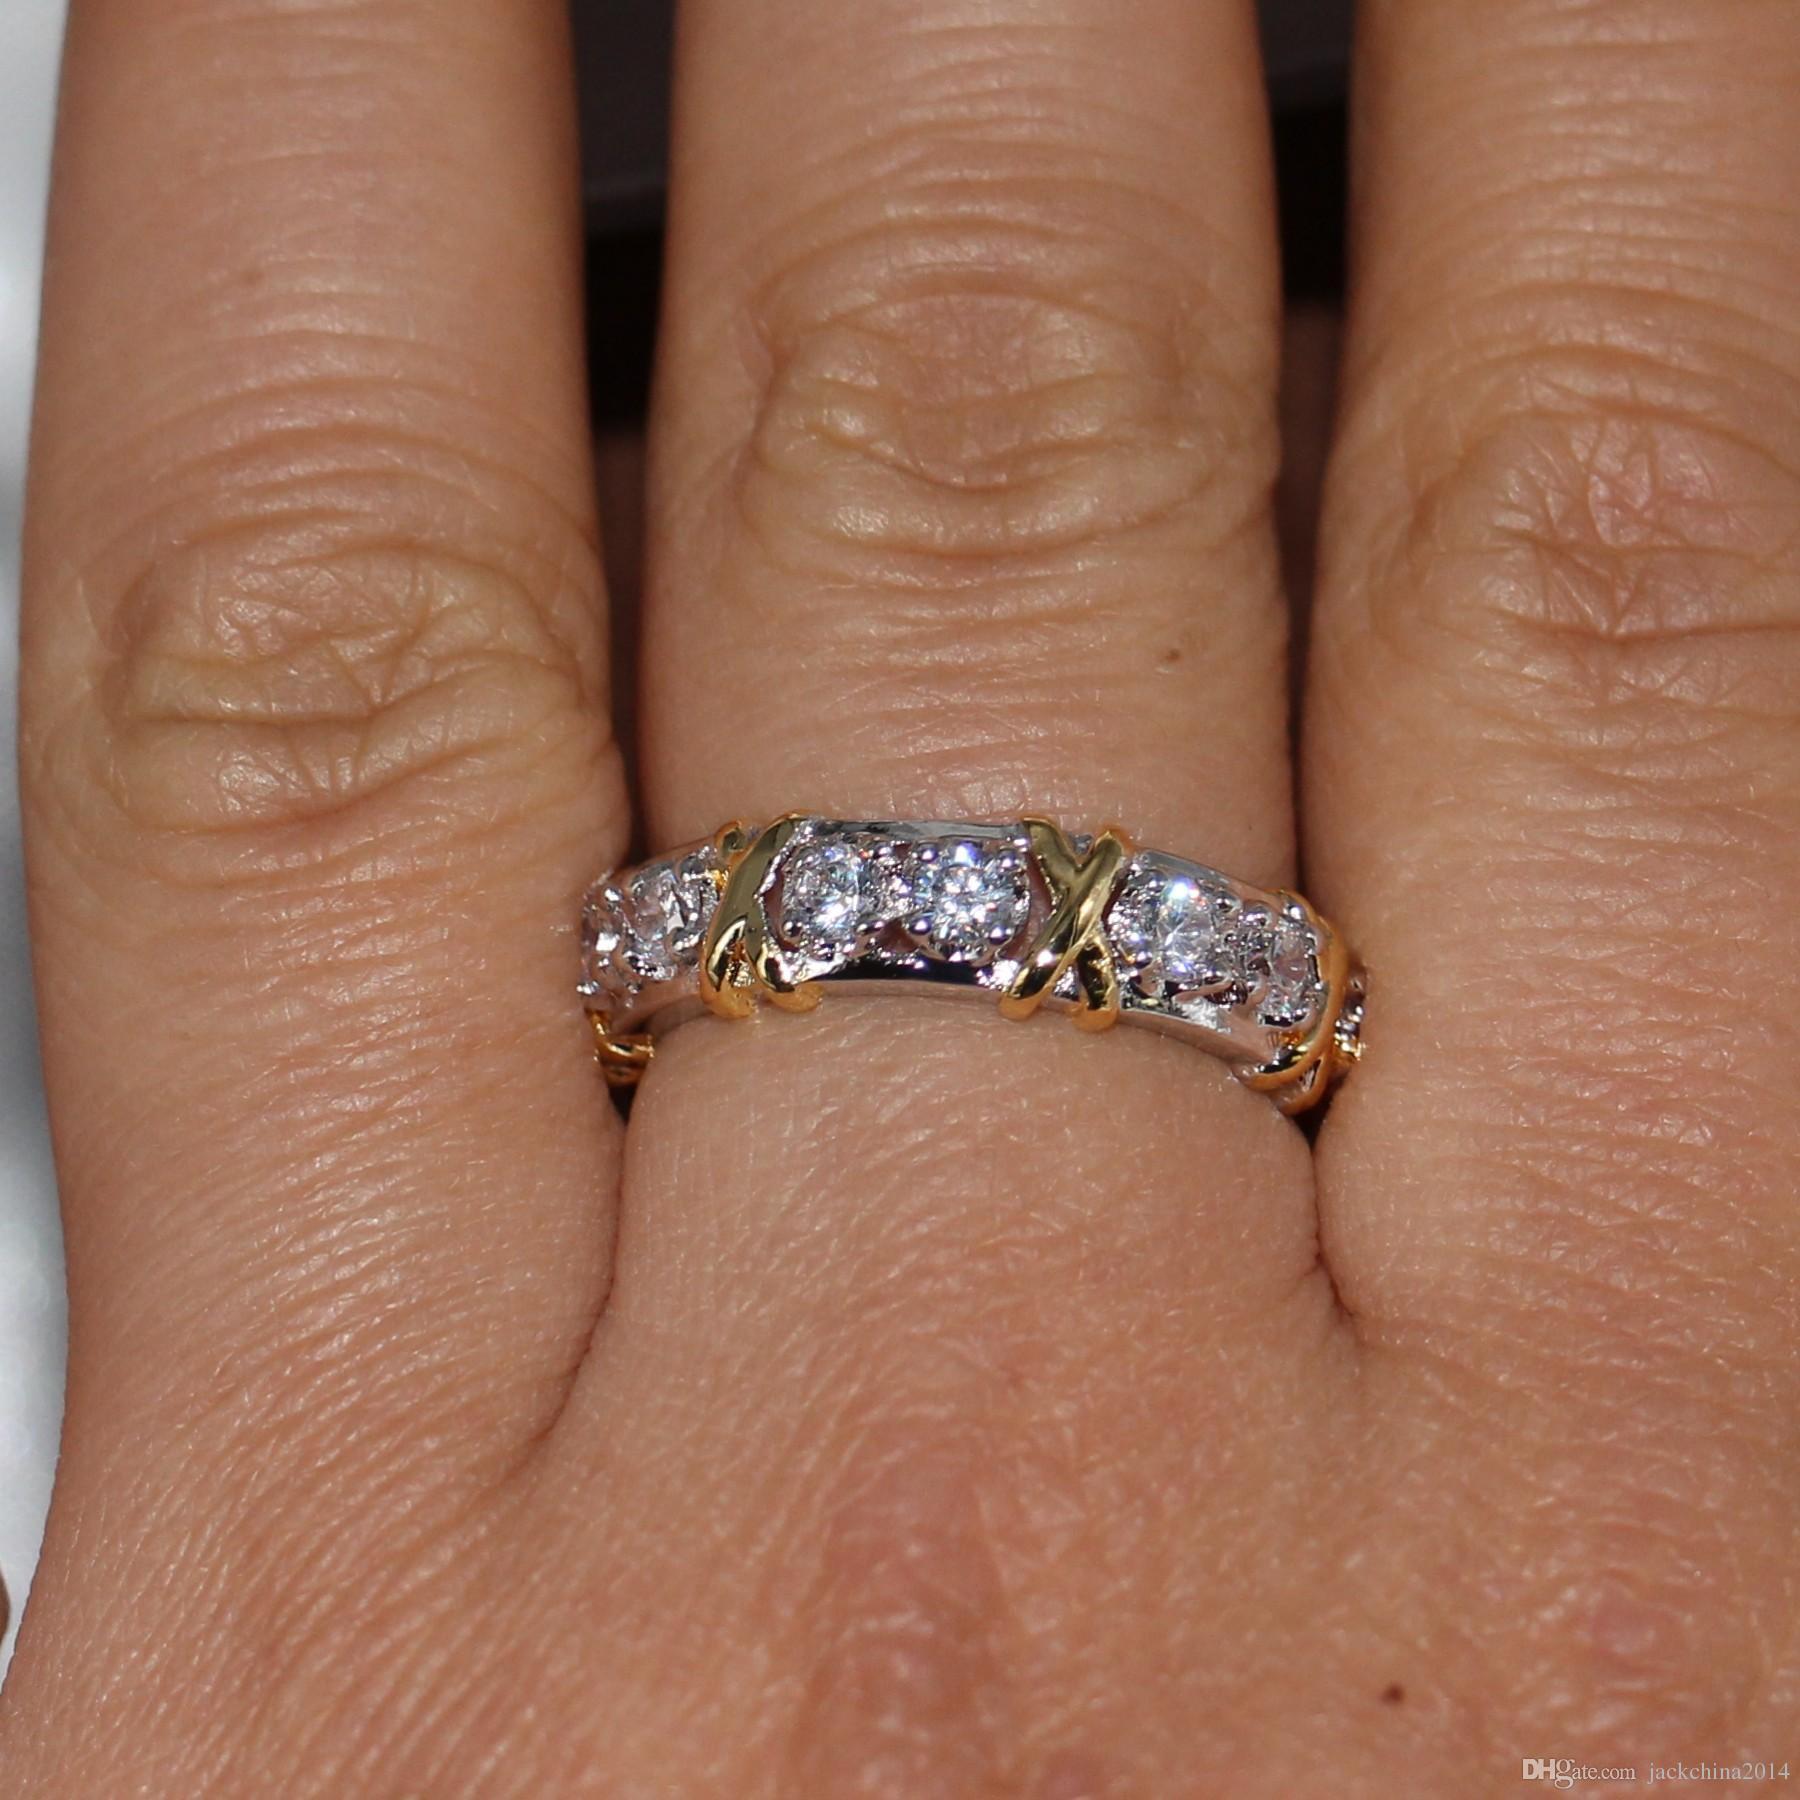 Wholesale Professional Eternity Diamonique CZ Simulated Diamond 10KT White&Yellow Gold Filled Wedding Band Cross Ring Size 5-11